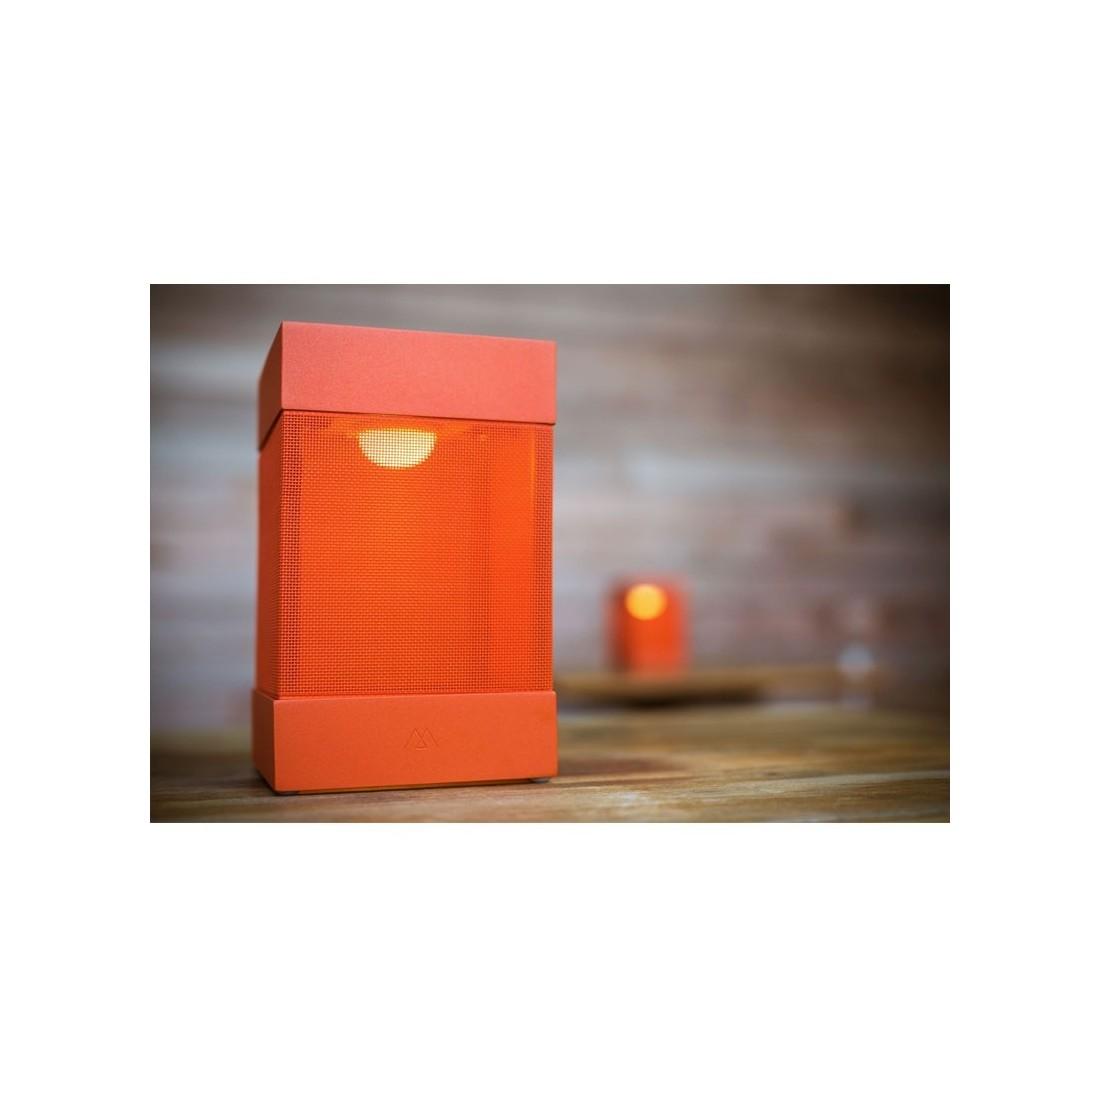 lampe solaire maiori pose 03. Black Bedroom Furniture Sets. Home Design Ideas